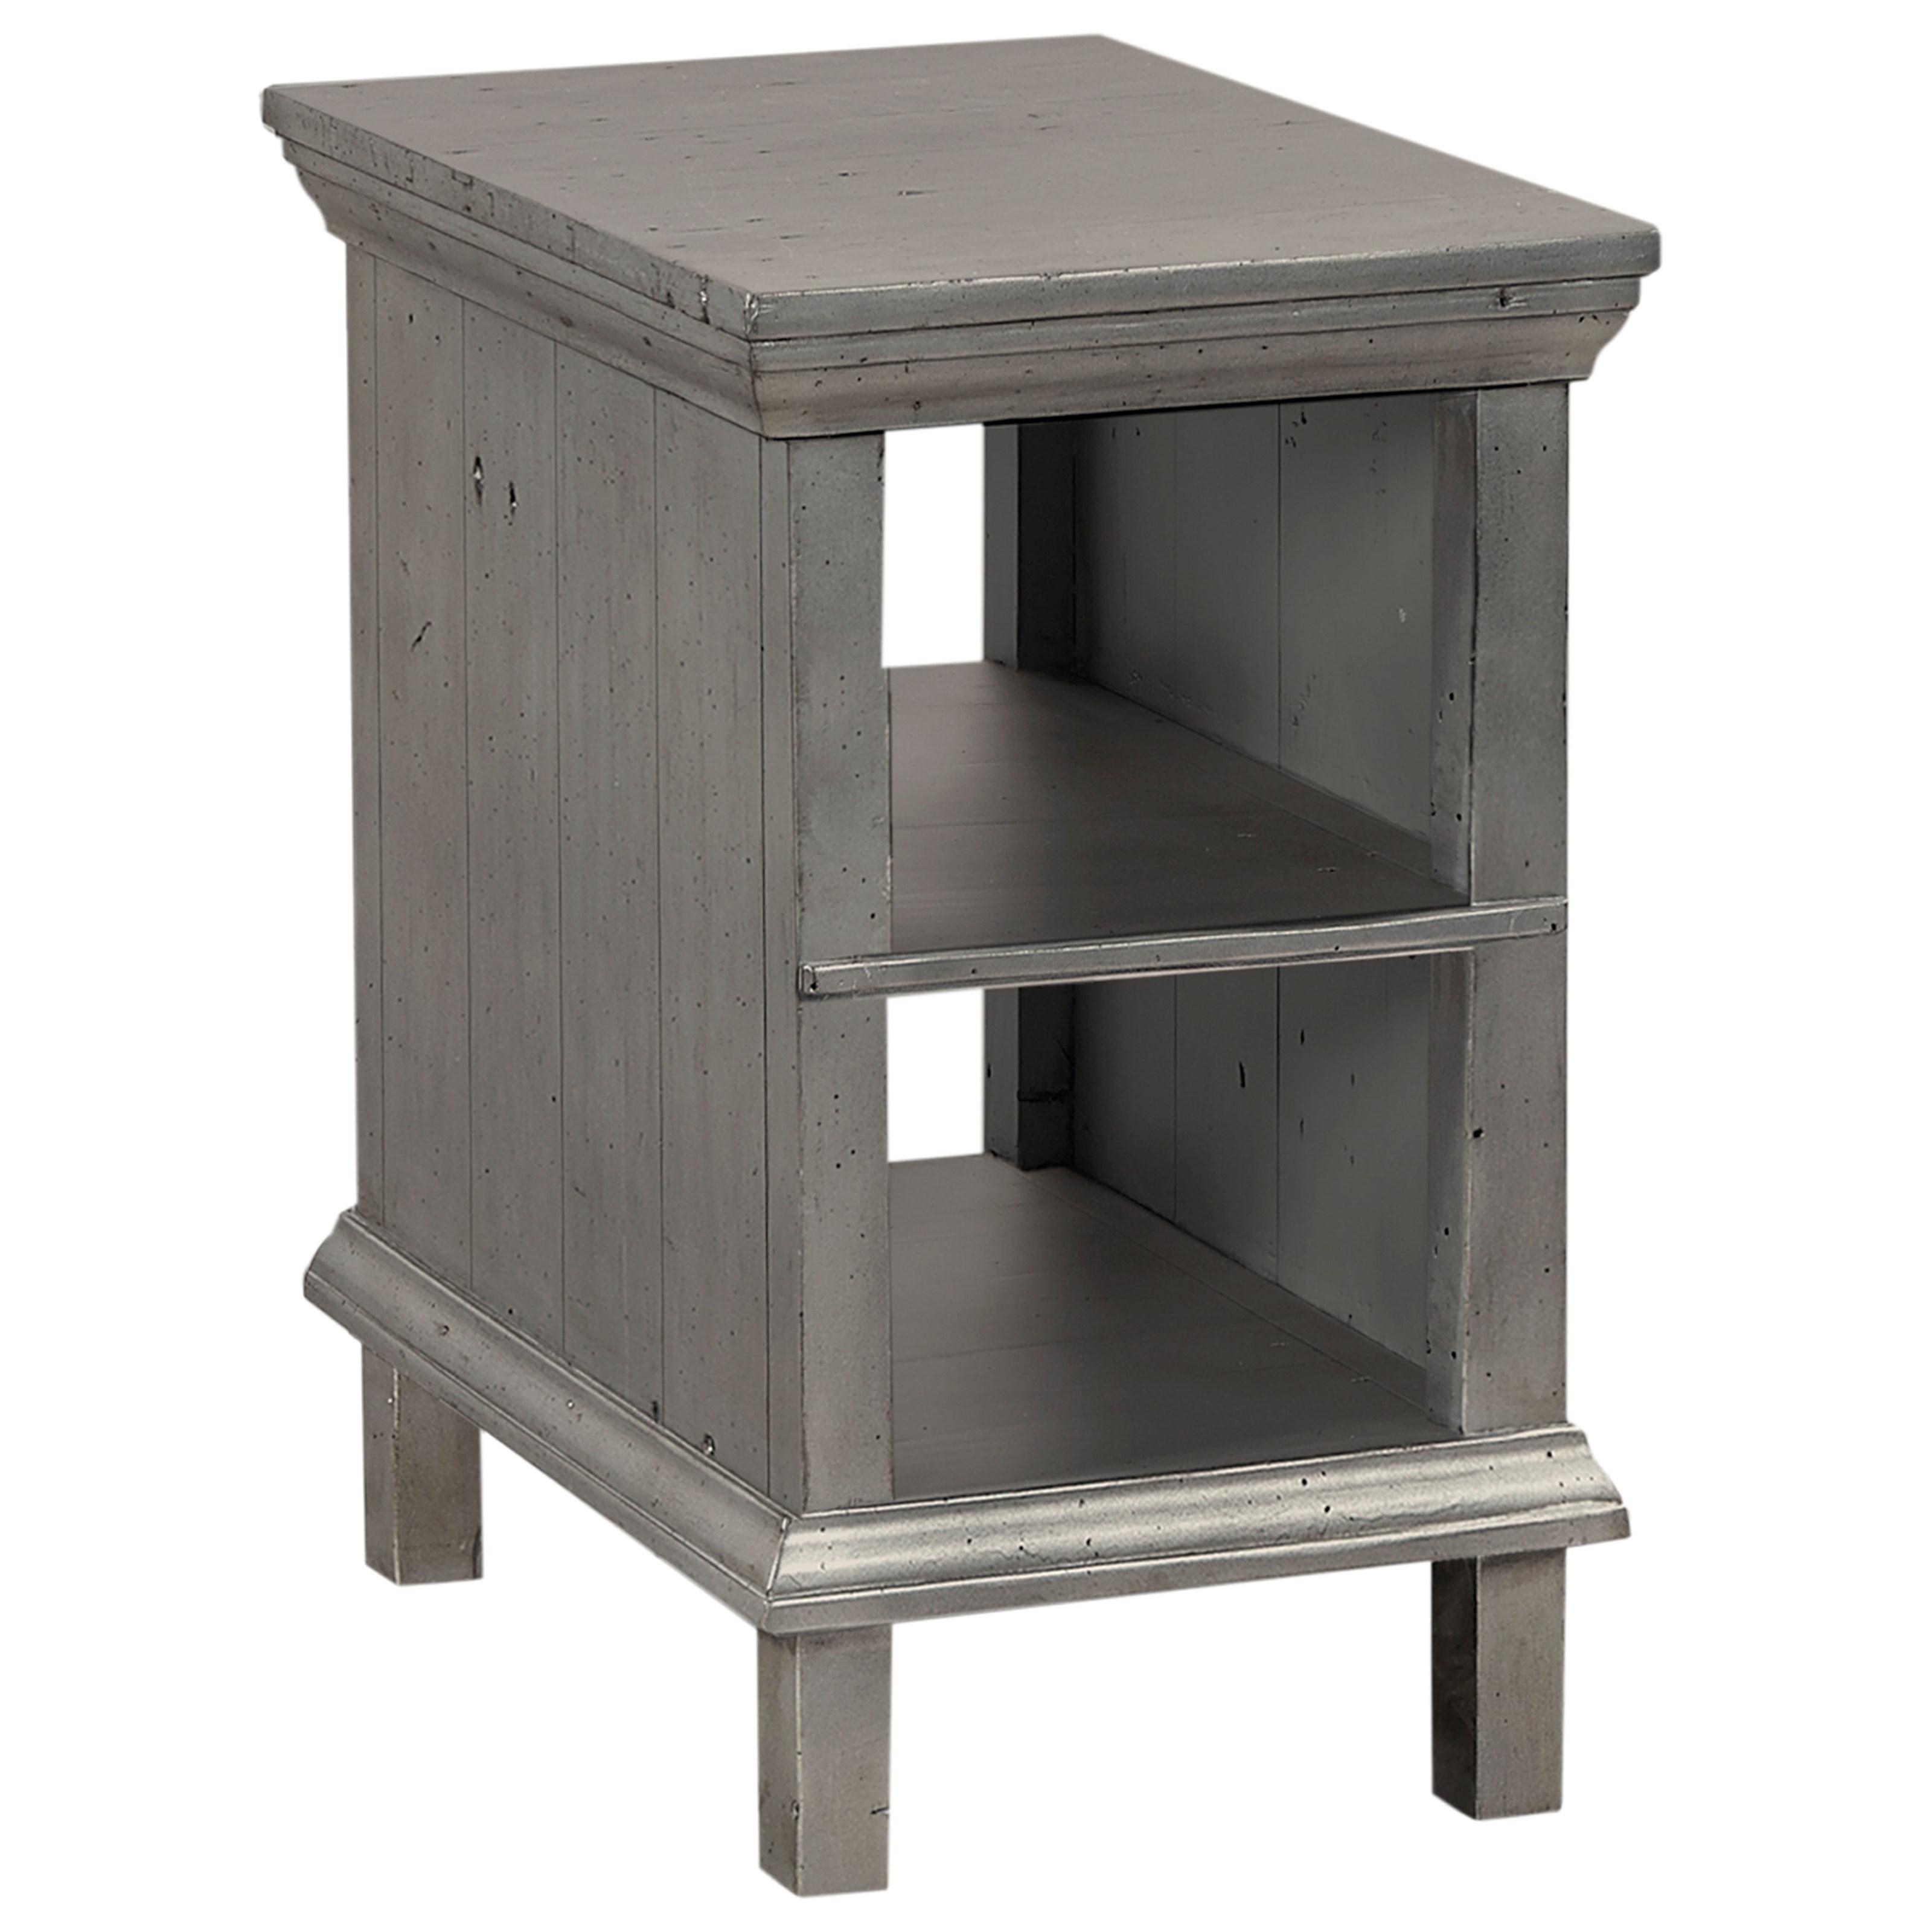 Hills of Aspen Preferences Chairside Table  - Item Number: I44-9130-MET